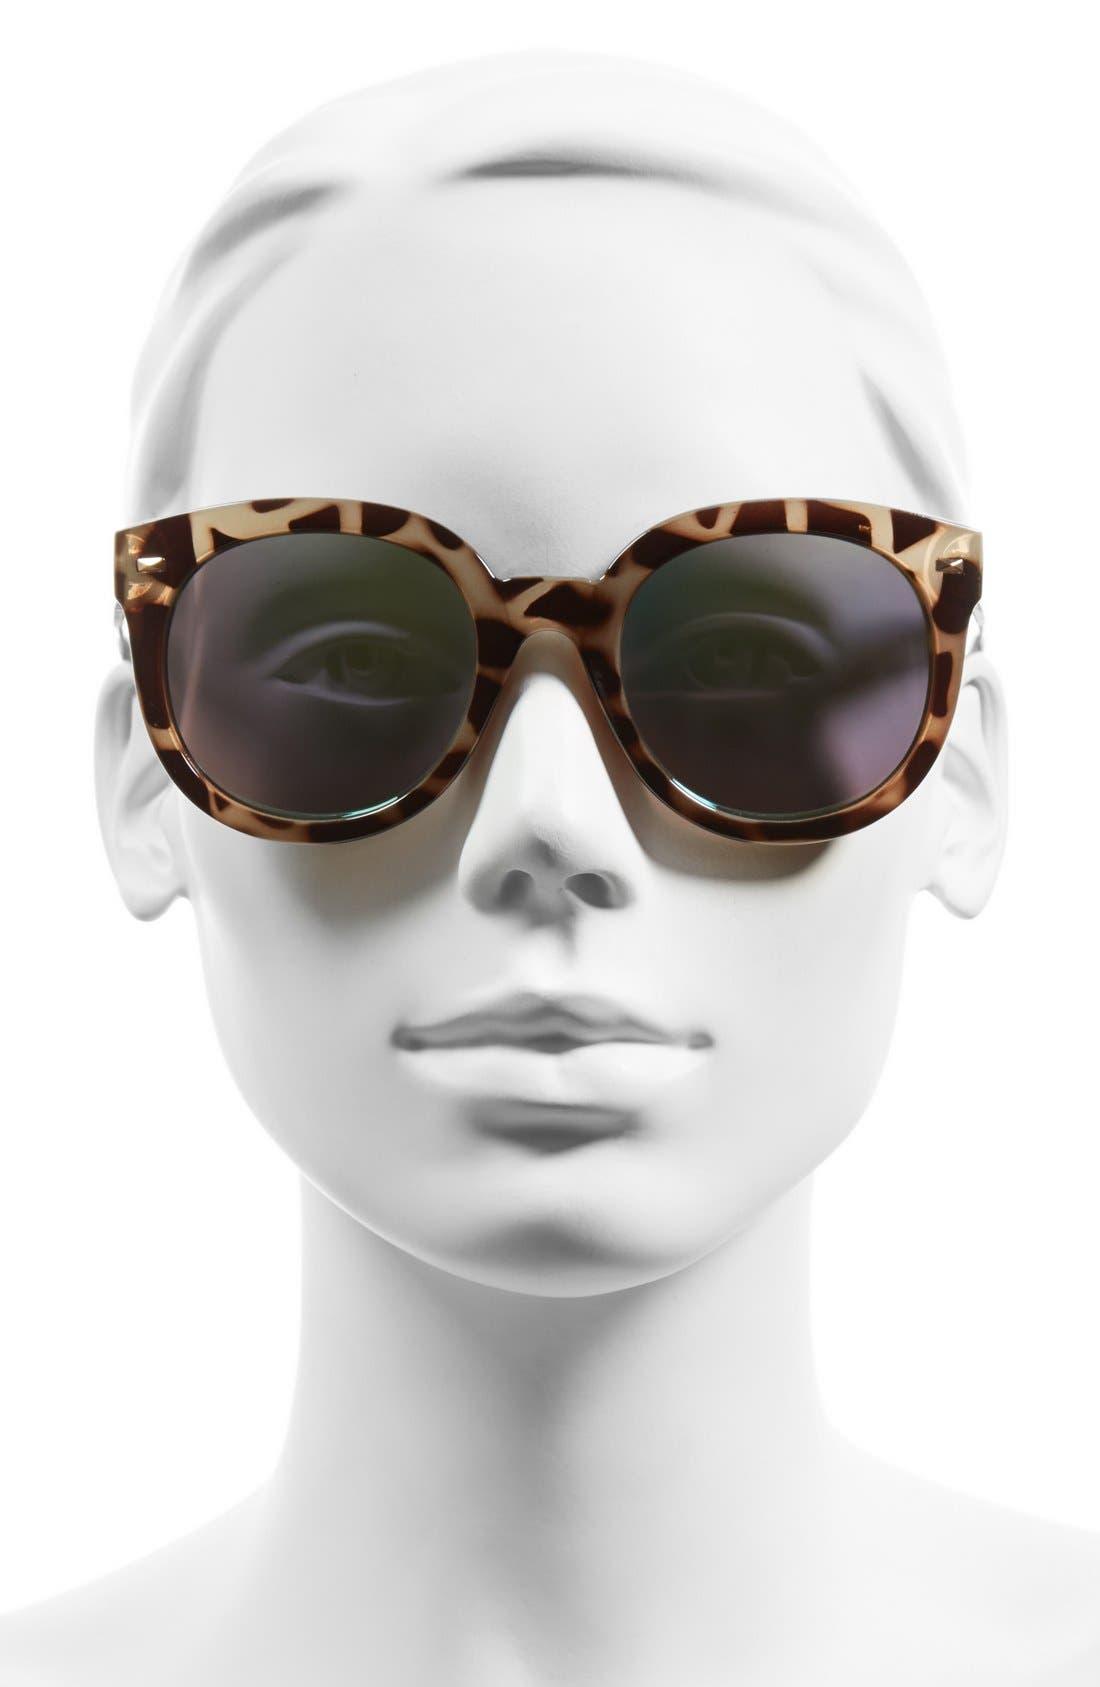 52mm Oversize Mirrored Sunglasses,                             Alternate thumbnail 2, color,                             Green/Grey Tort